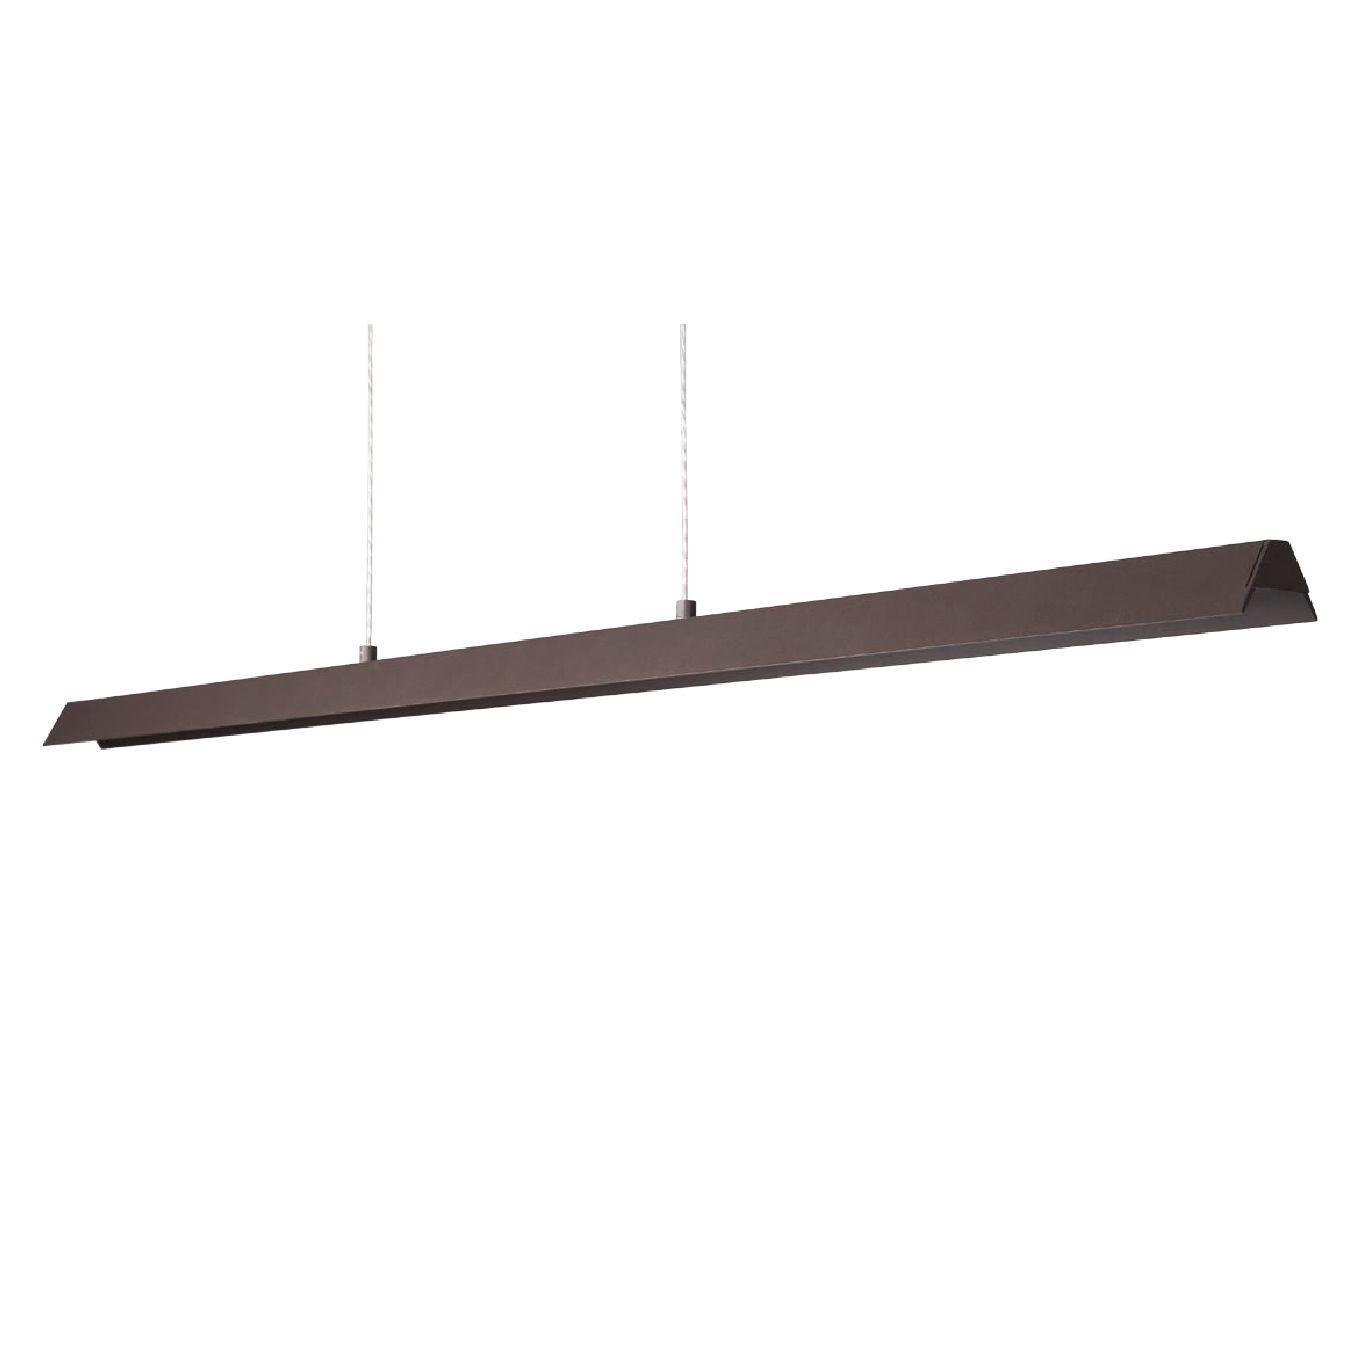 Alcon Lighting 12131 Linear Trapezium 5 Foot LED Pendant Mount Fixture